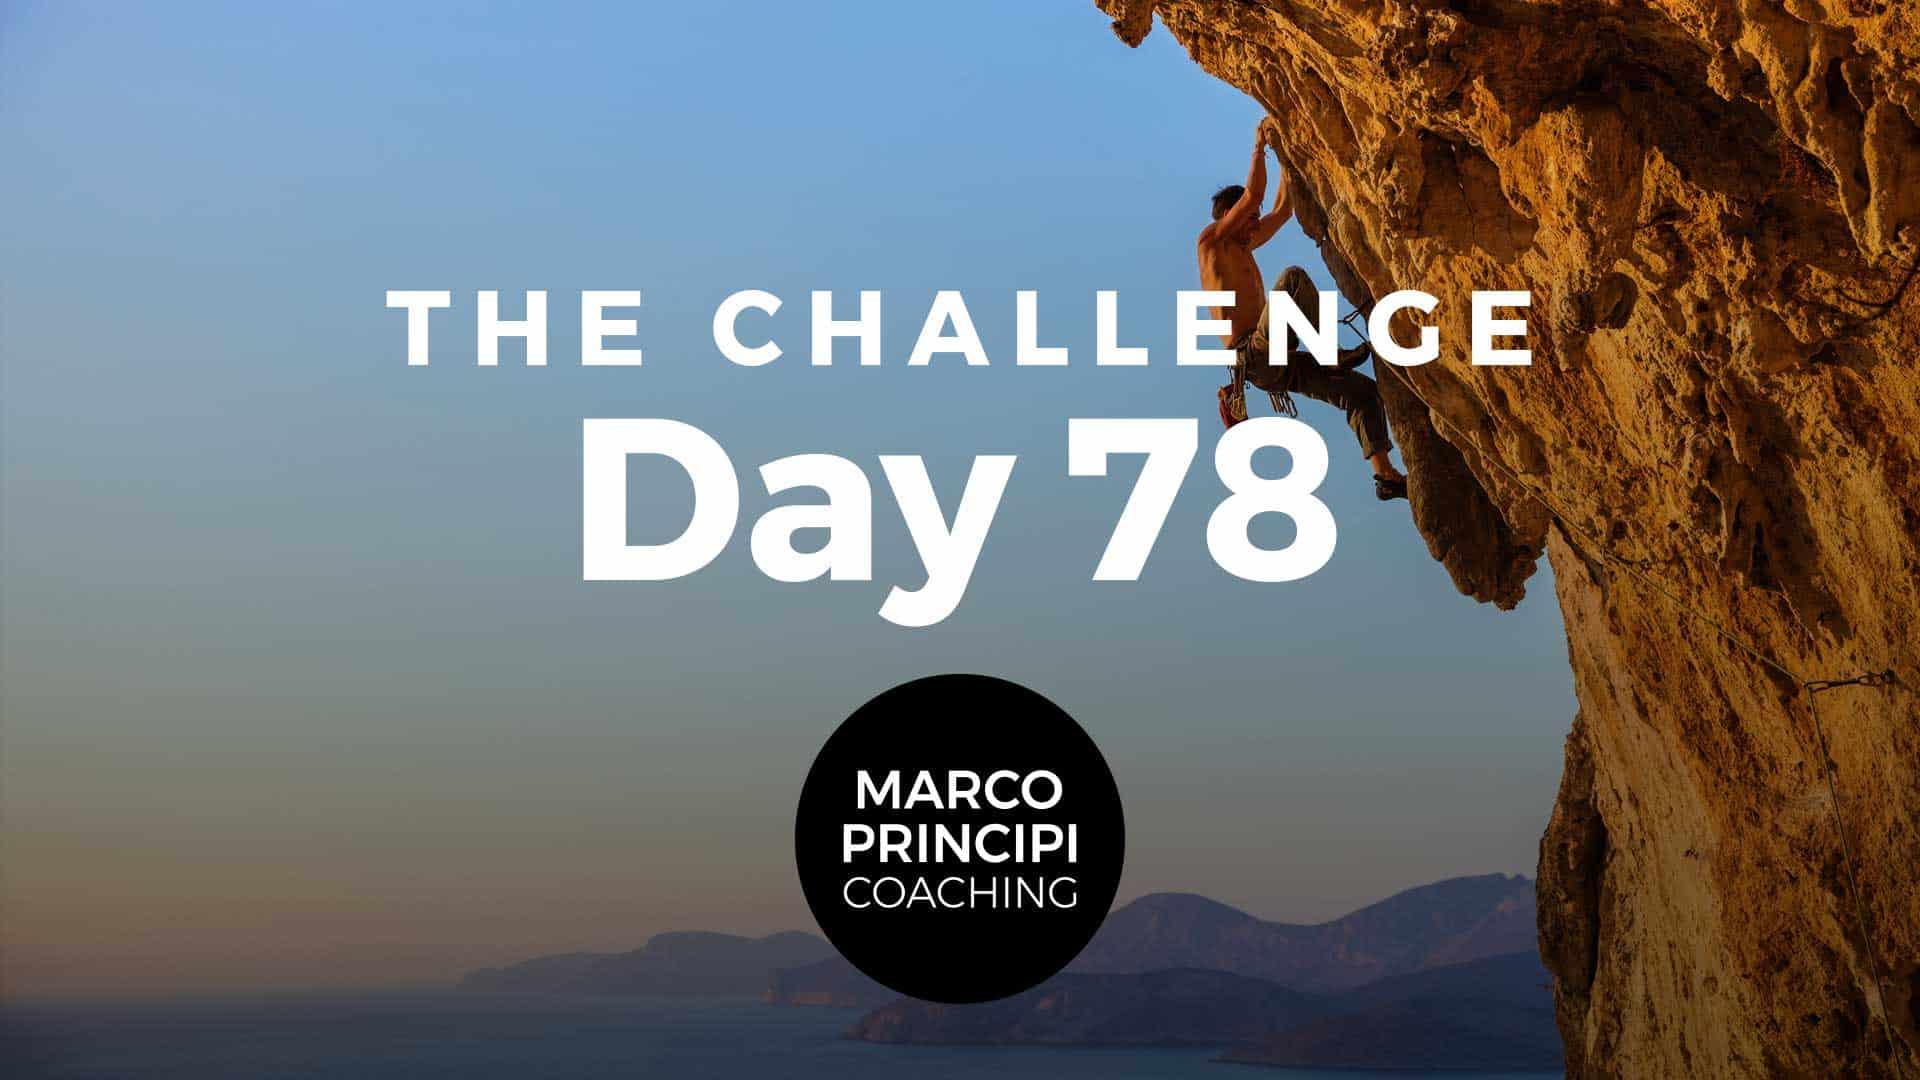 Marco Principi Coaching Challenge Day 78